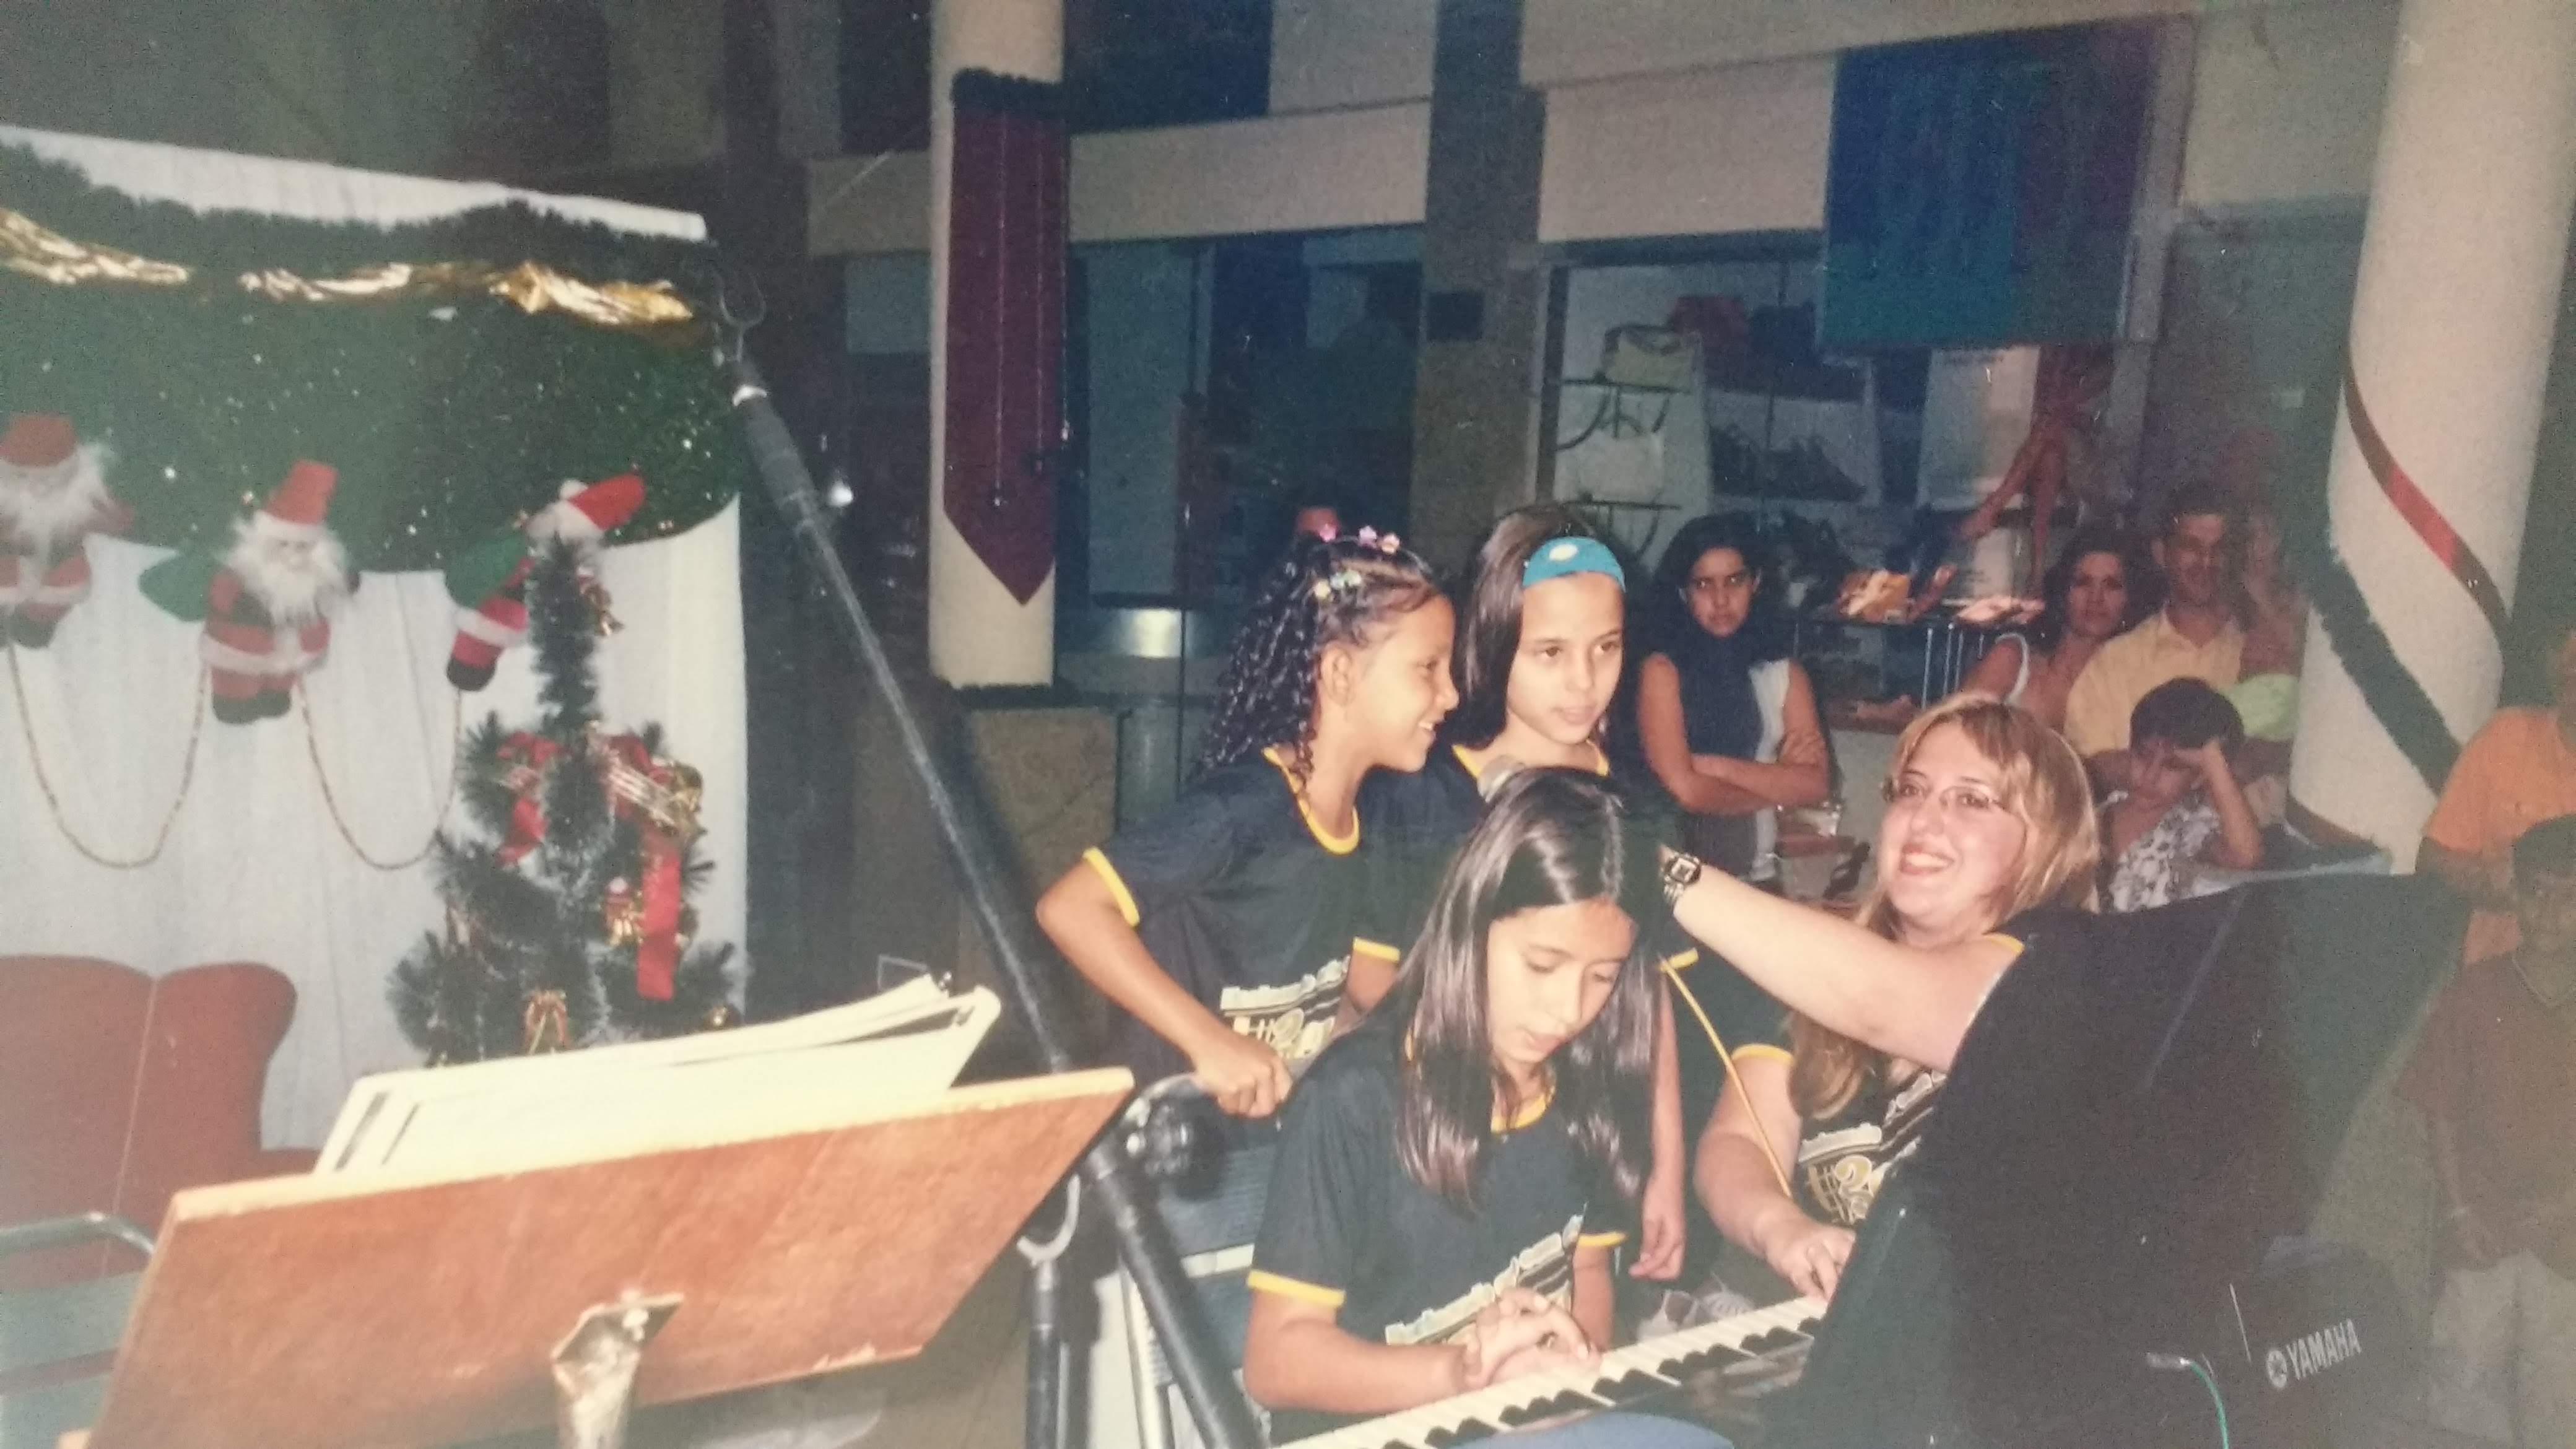 recital de alunos de musica aula de teclado em juiz de fora, aula de musica em juiz de fora, aprender teclado, aprender piano, piano professor em jf, aprender a tocar piano, aprender a tocar teclado, @lucianetecladista,  professora de teclado, professora de piano, professor de musica em juiz de fora, professora de musica em juiz de fora,   professora de teclado curso de teclado professora Luciane Borges @lucianetecladista #escolademusicabemol